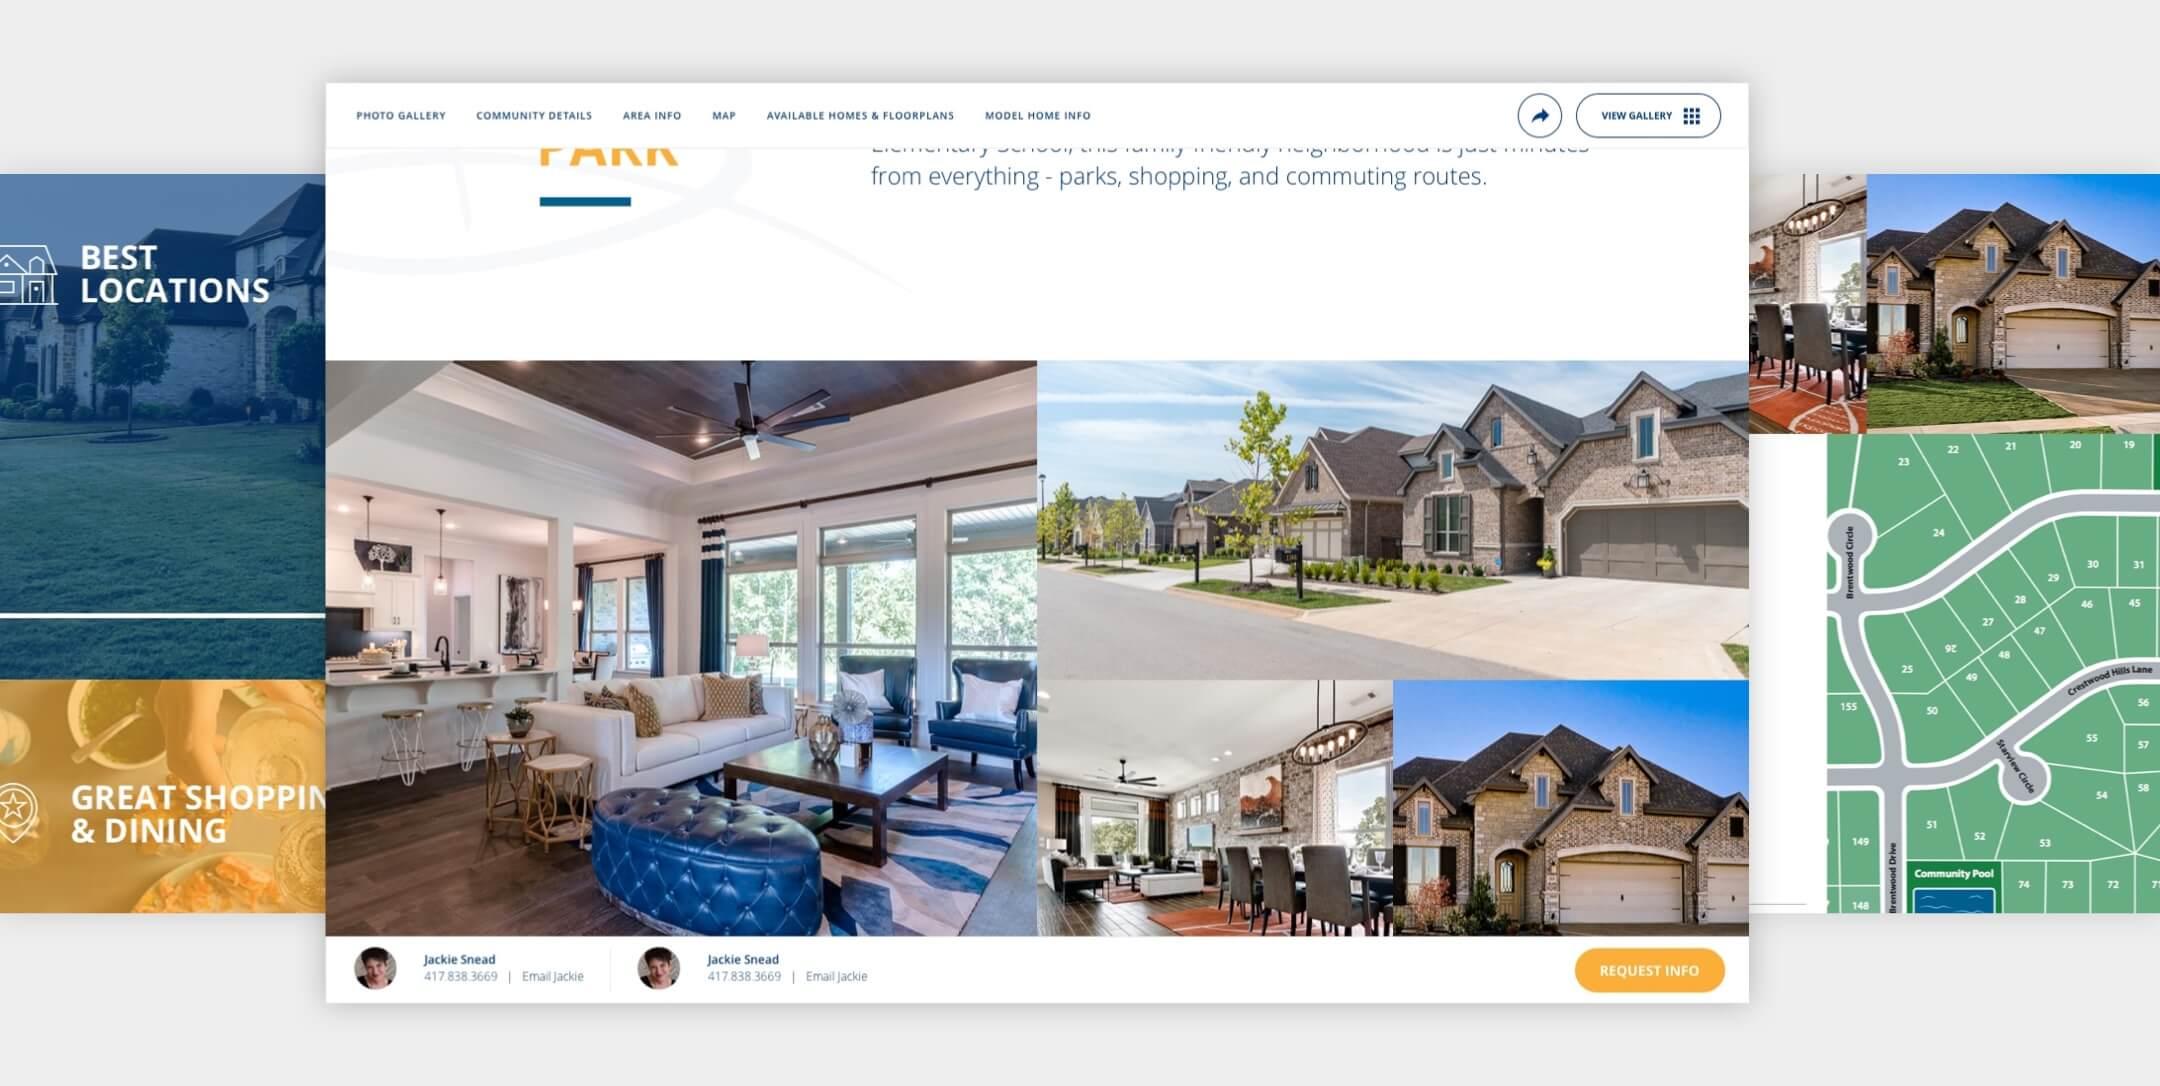 buffington homes website designs